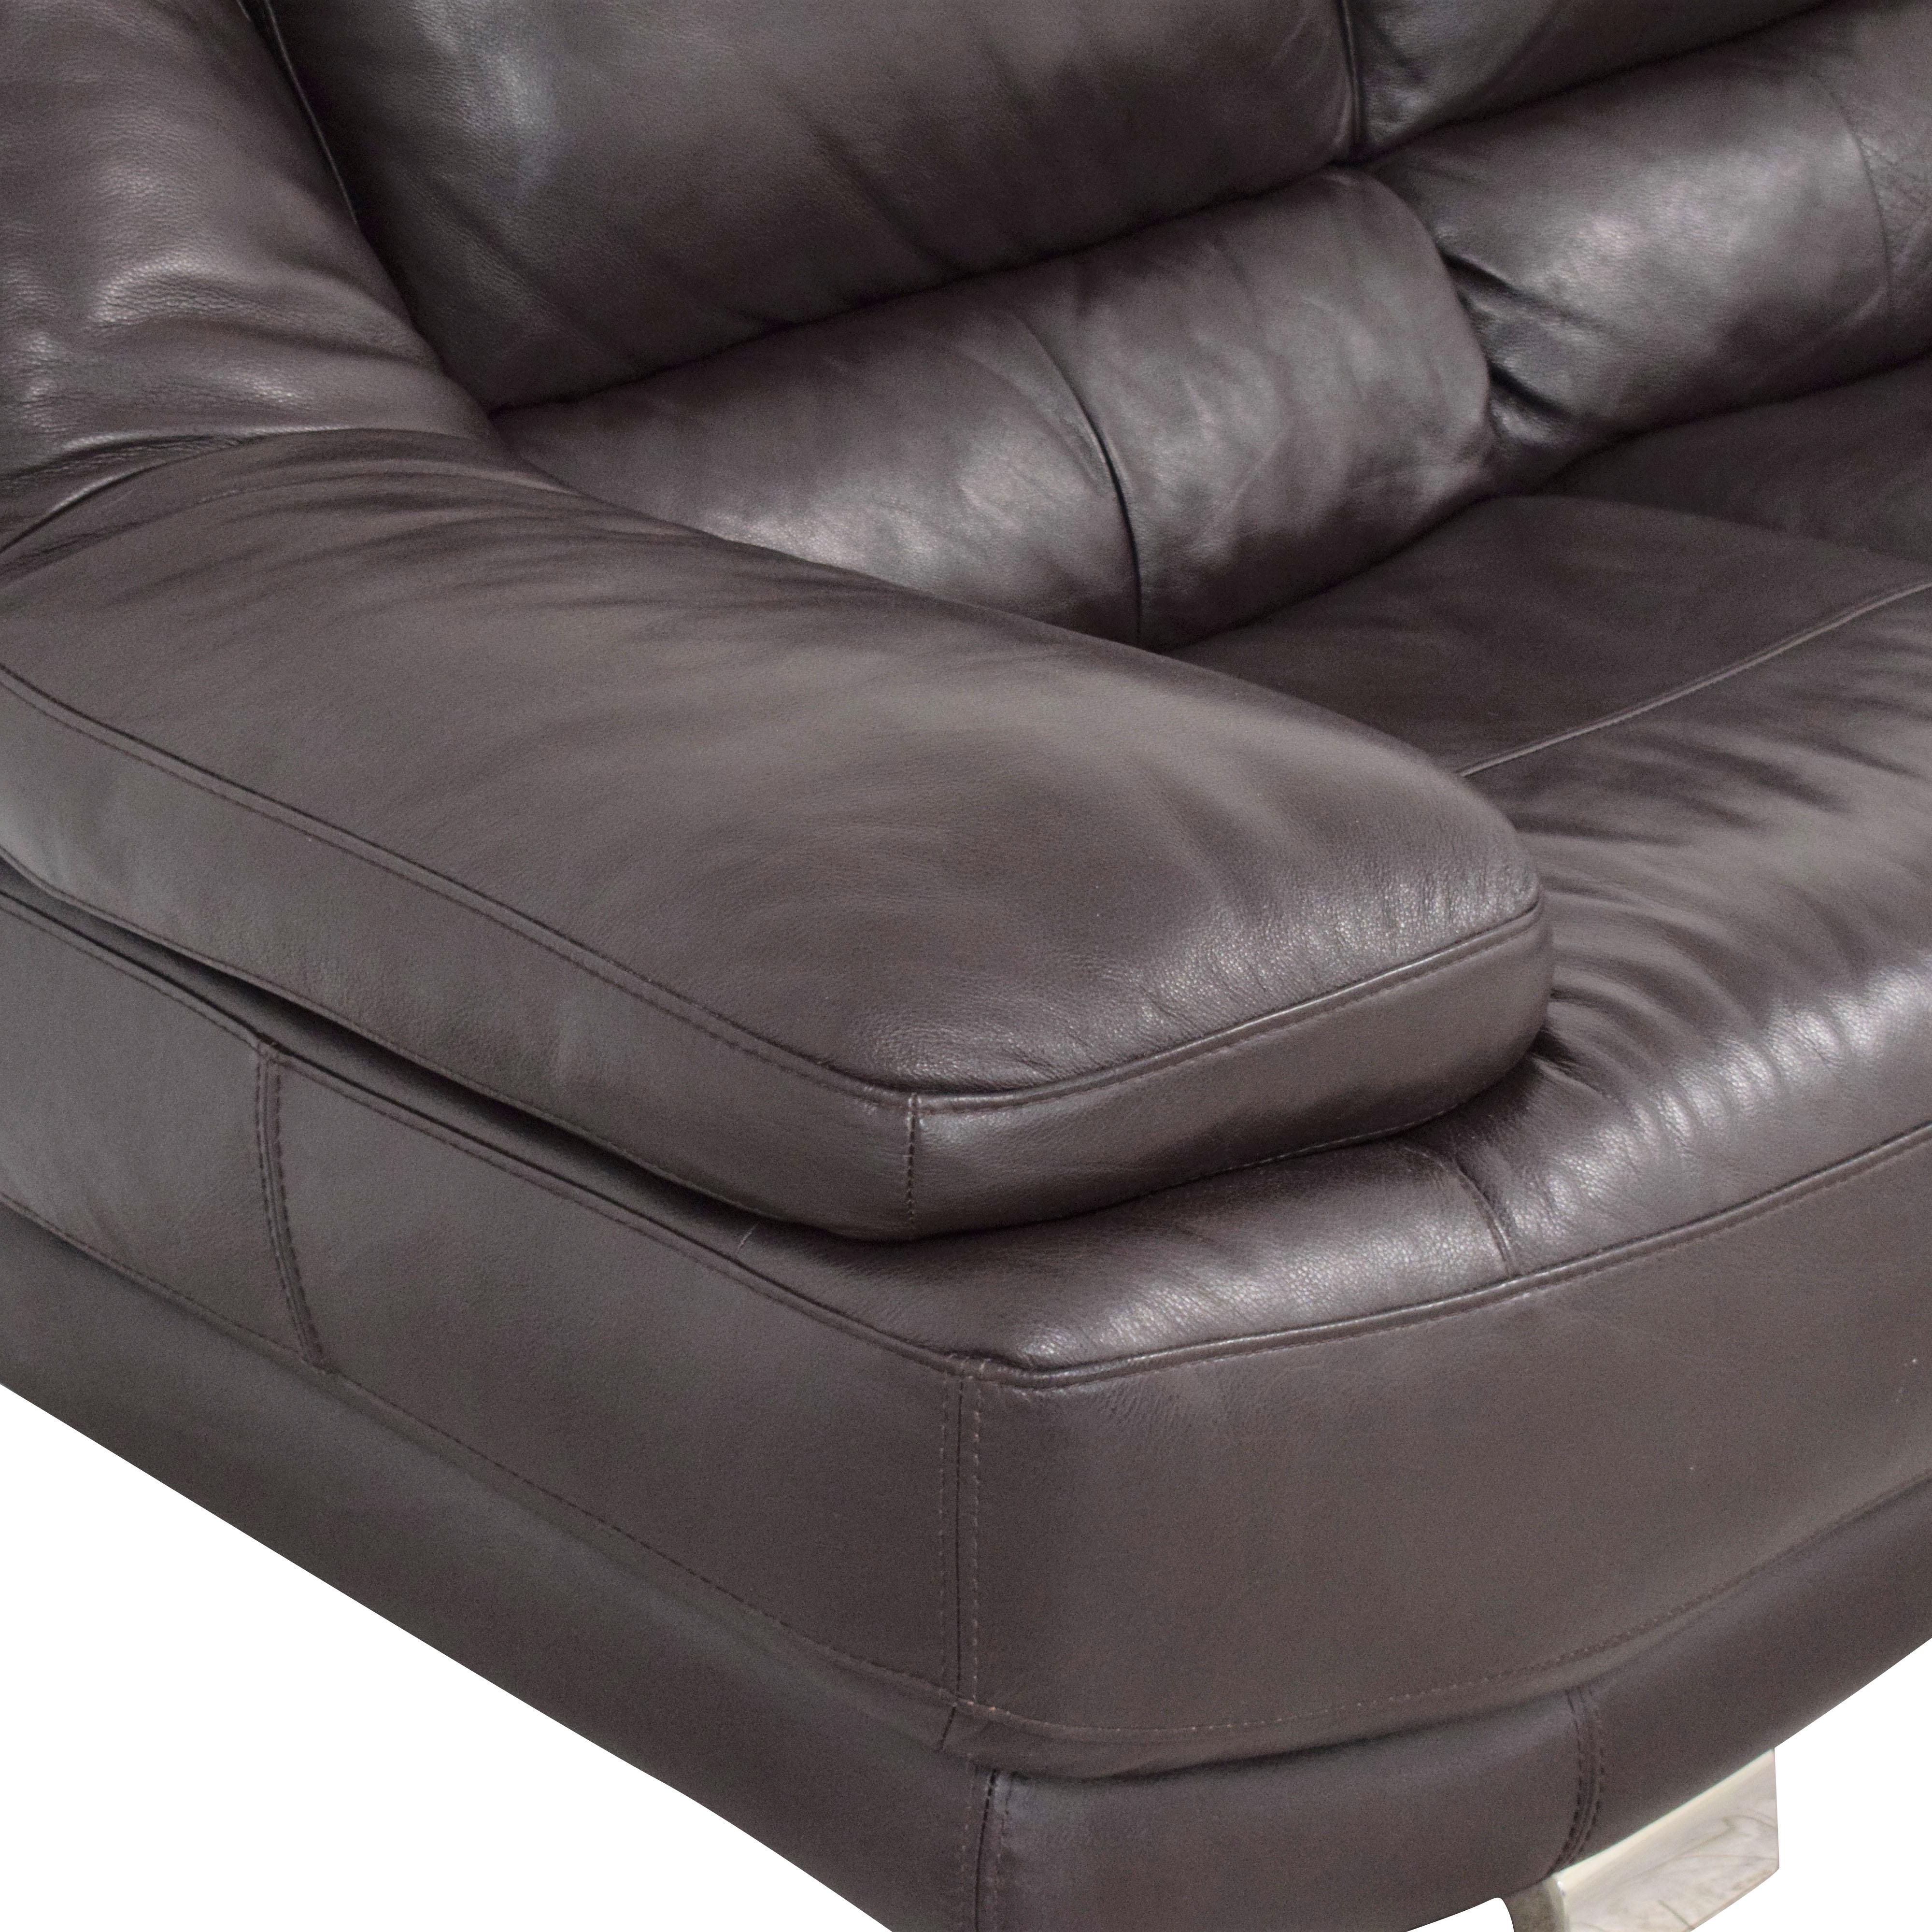 shop Raymour & Flanigan Three Seat Sofa Raymour & Flanigan